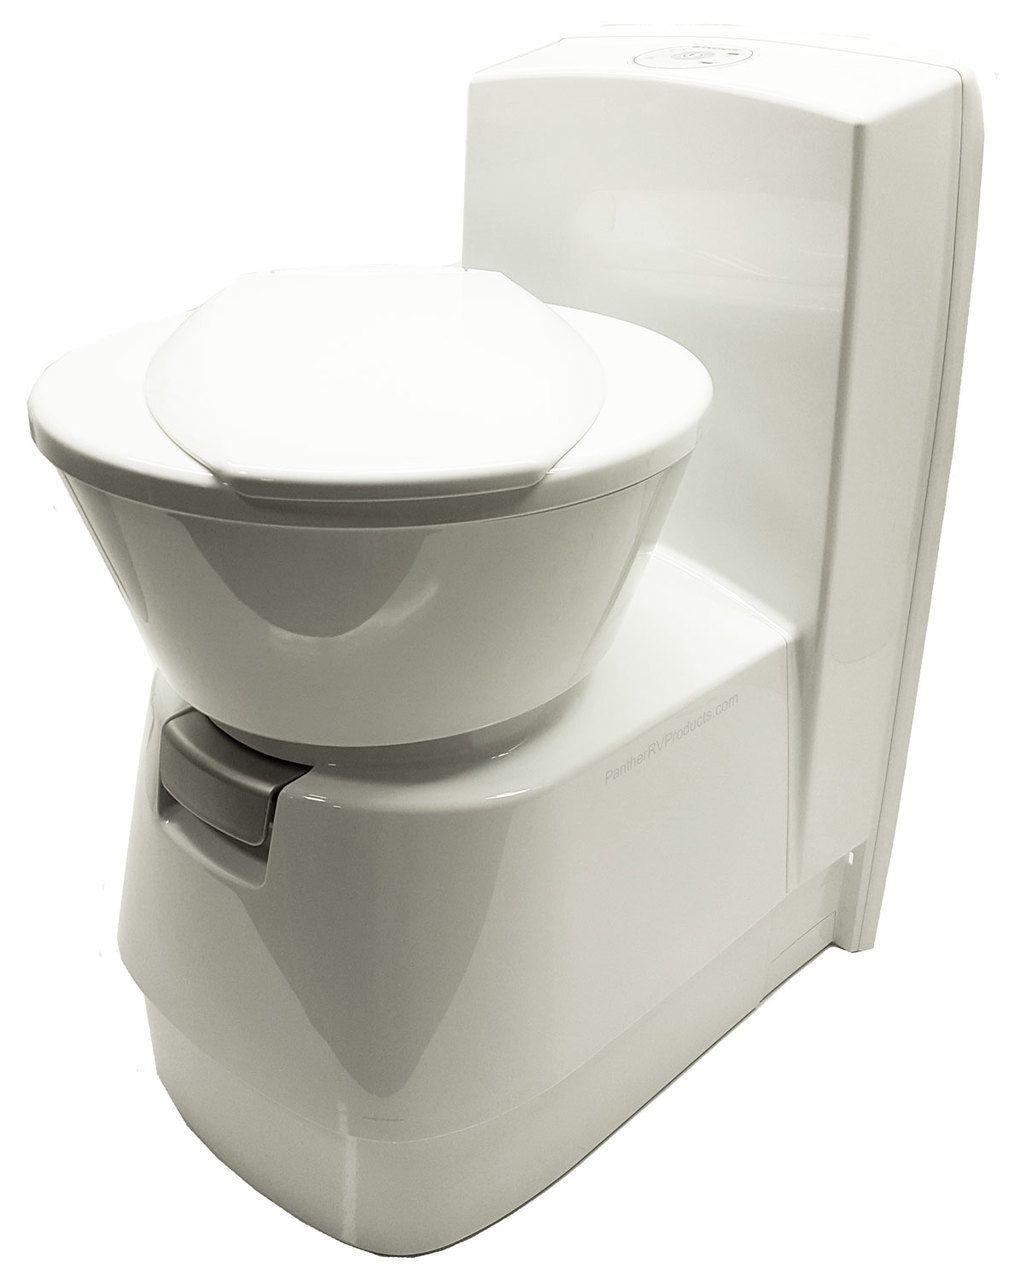 Dometic Cts4110us 1 Lightweight Rv Van Cassette Toilet Camper